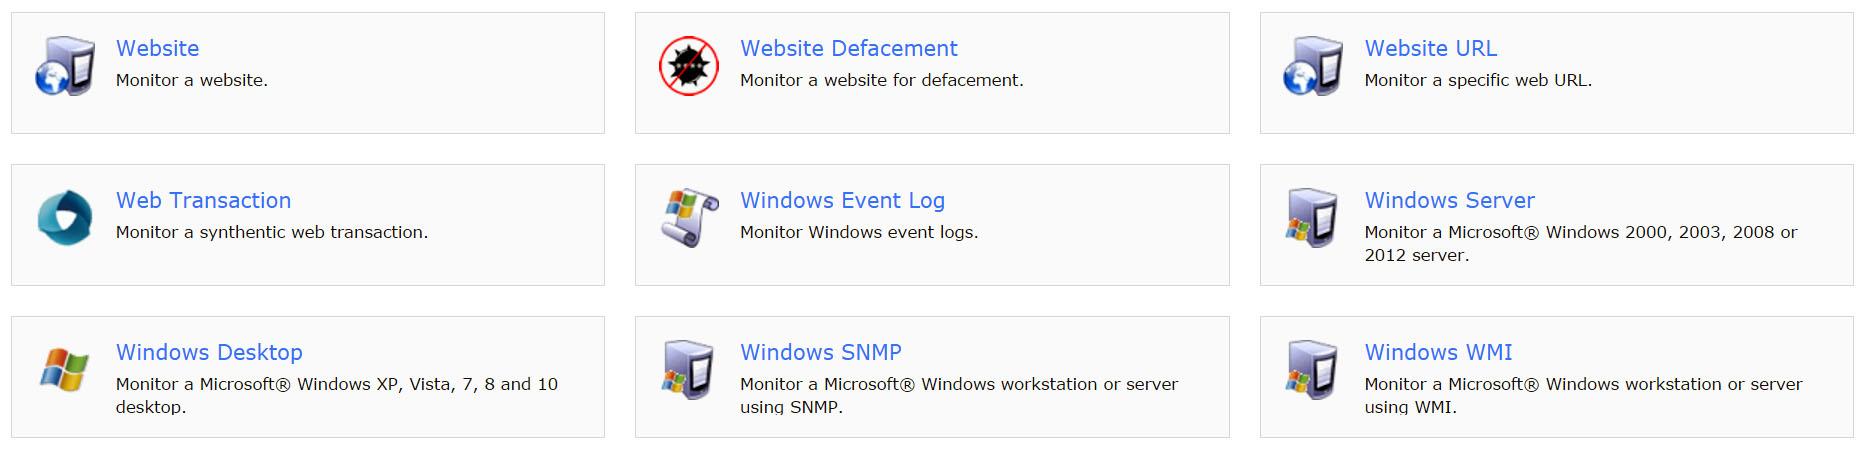 windowsservicemonitoring 1